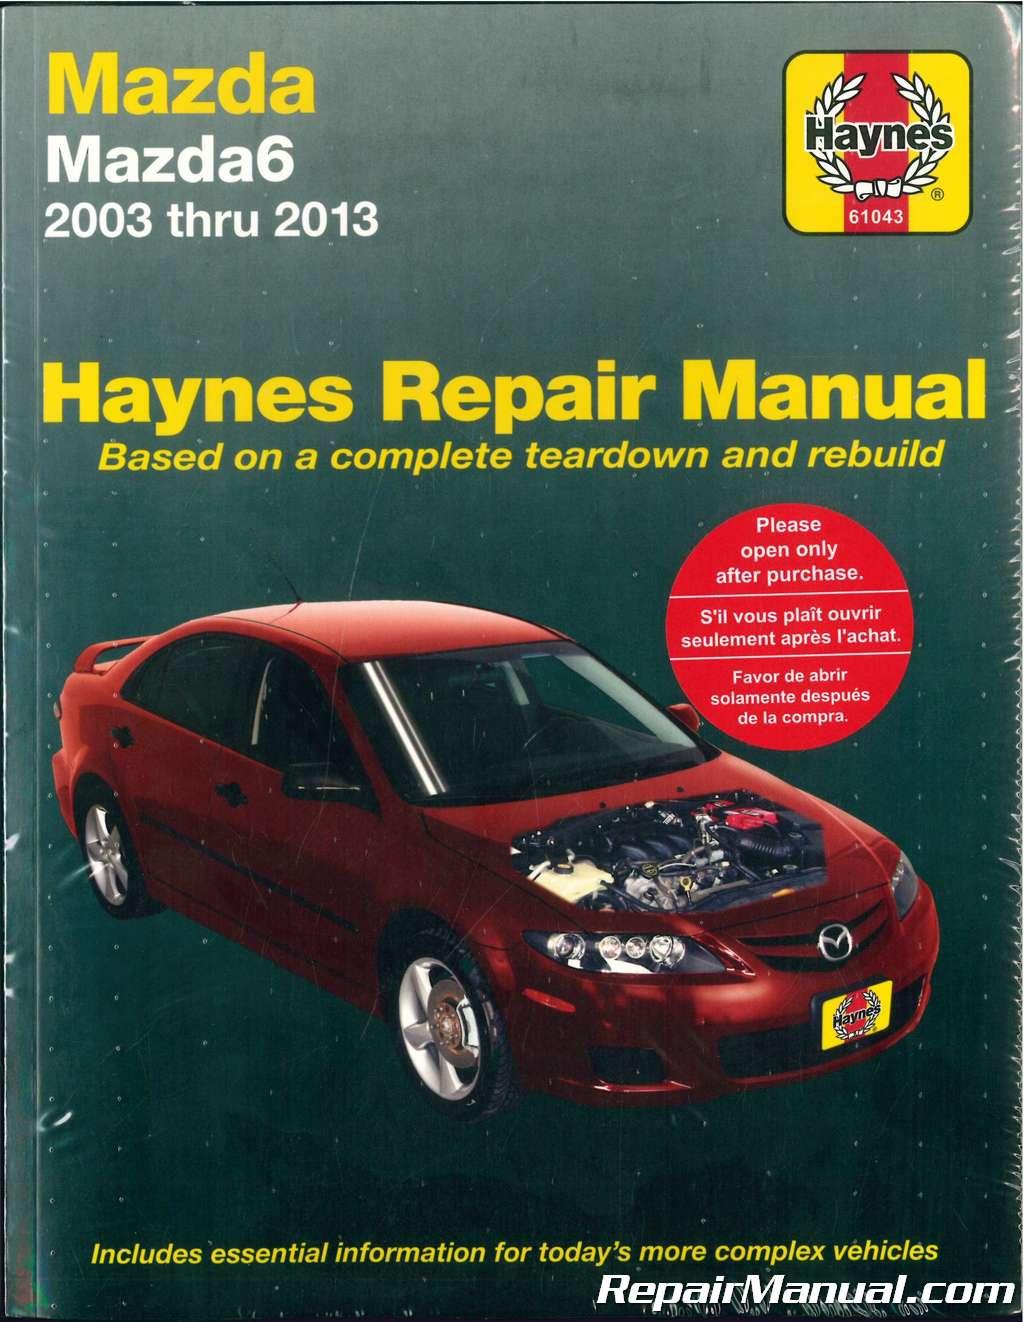 manual mazda 6 2003 español